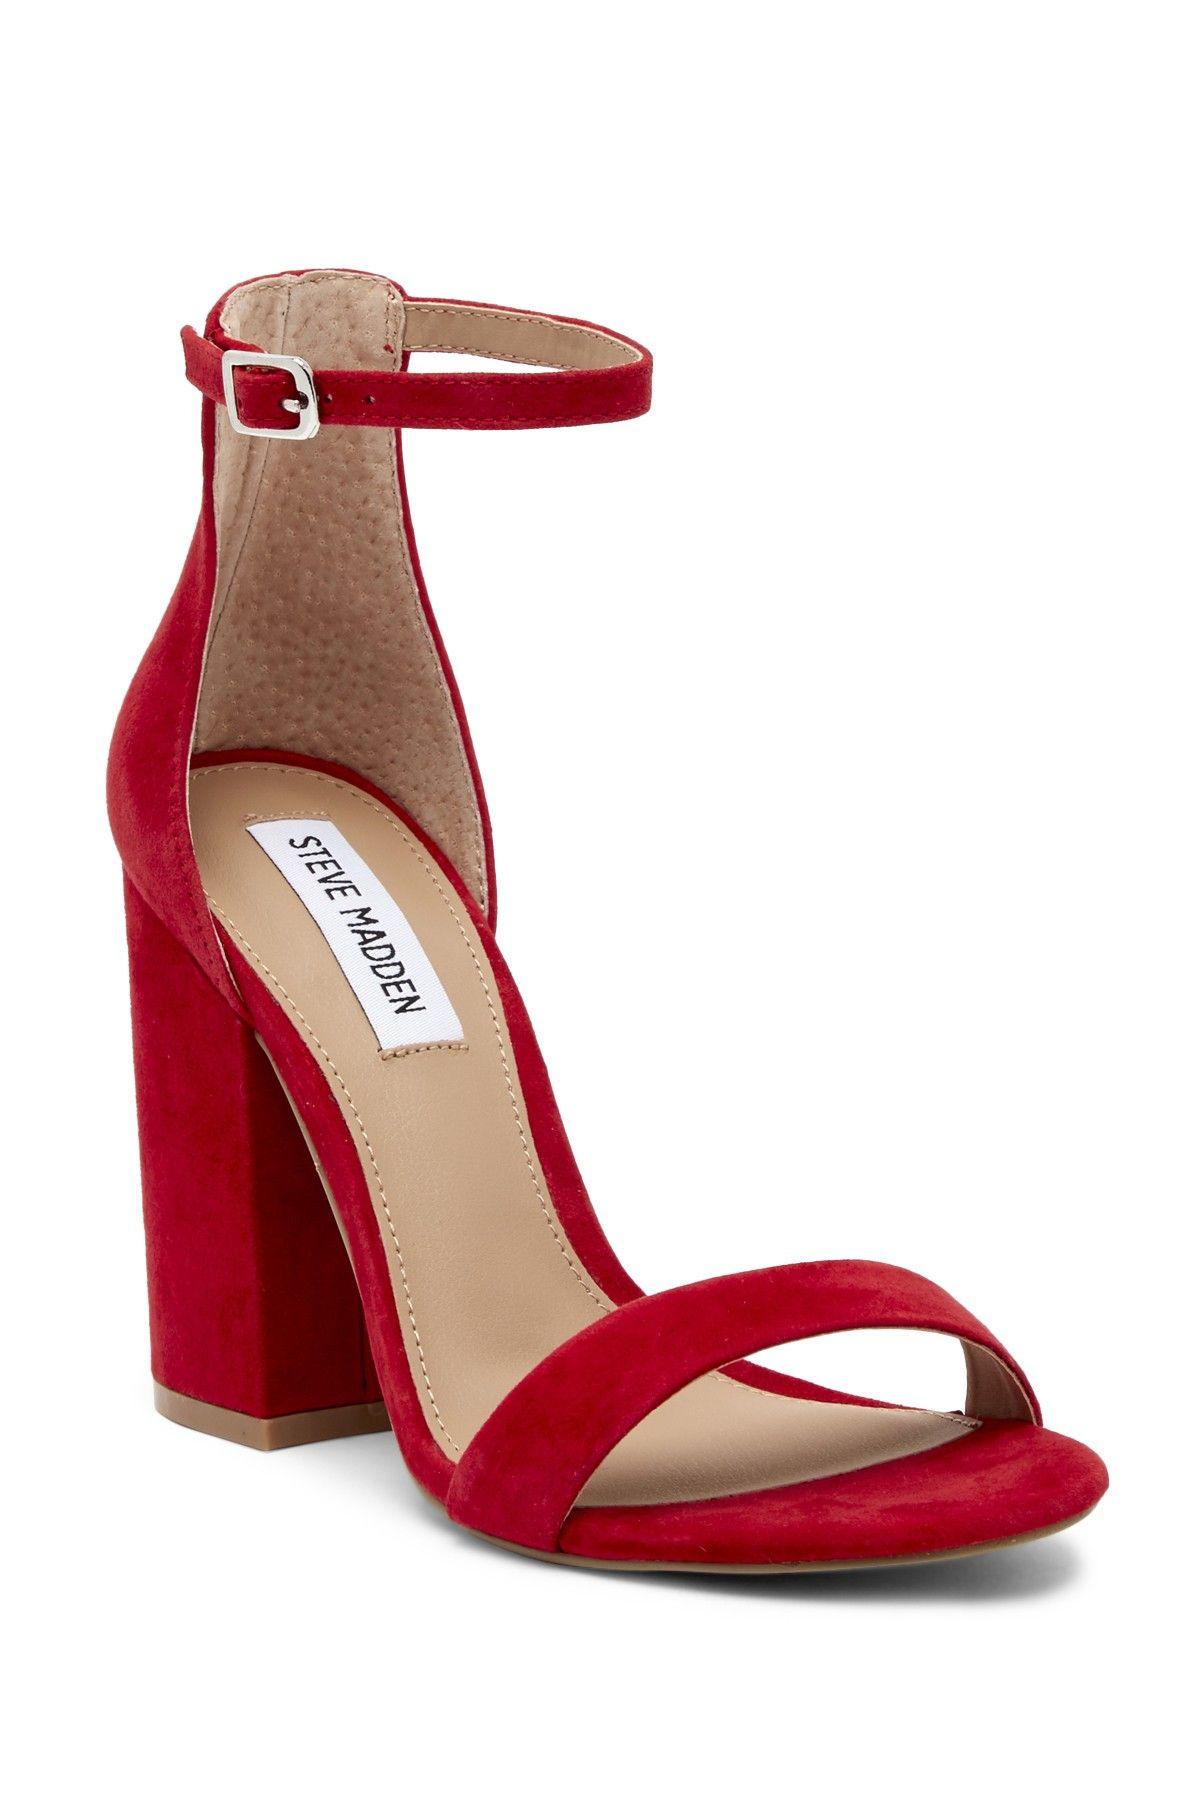 58403f5b455 Steve Madden Frame Ankle Strap Block Heel Sandal | Products | Ankle ...